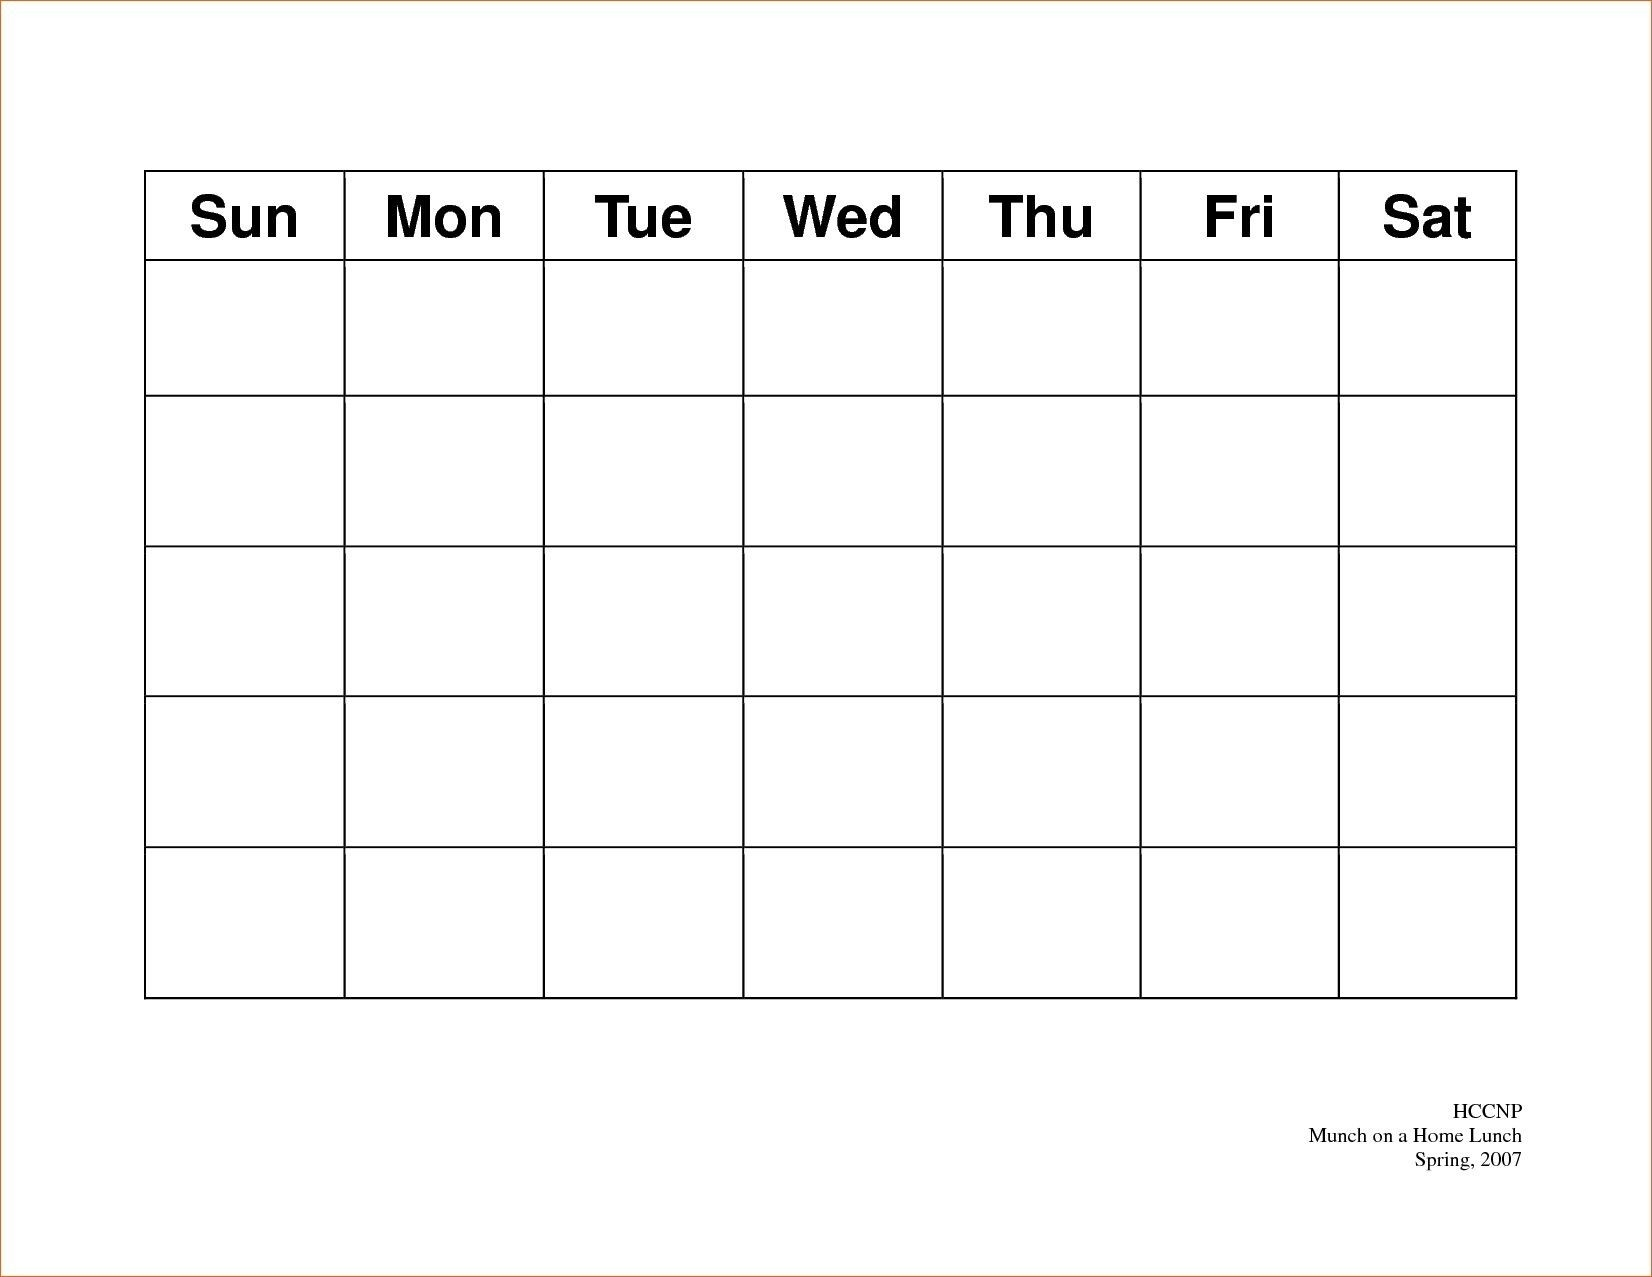 Calendar 5 Day Weekly Calendar Template On 5 Week Calendar-5 Day Weekly Planner Template